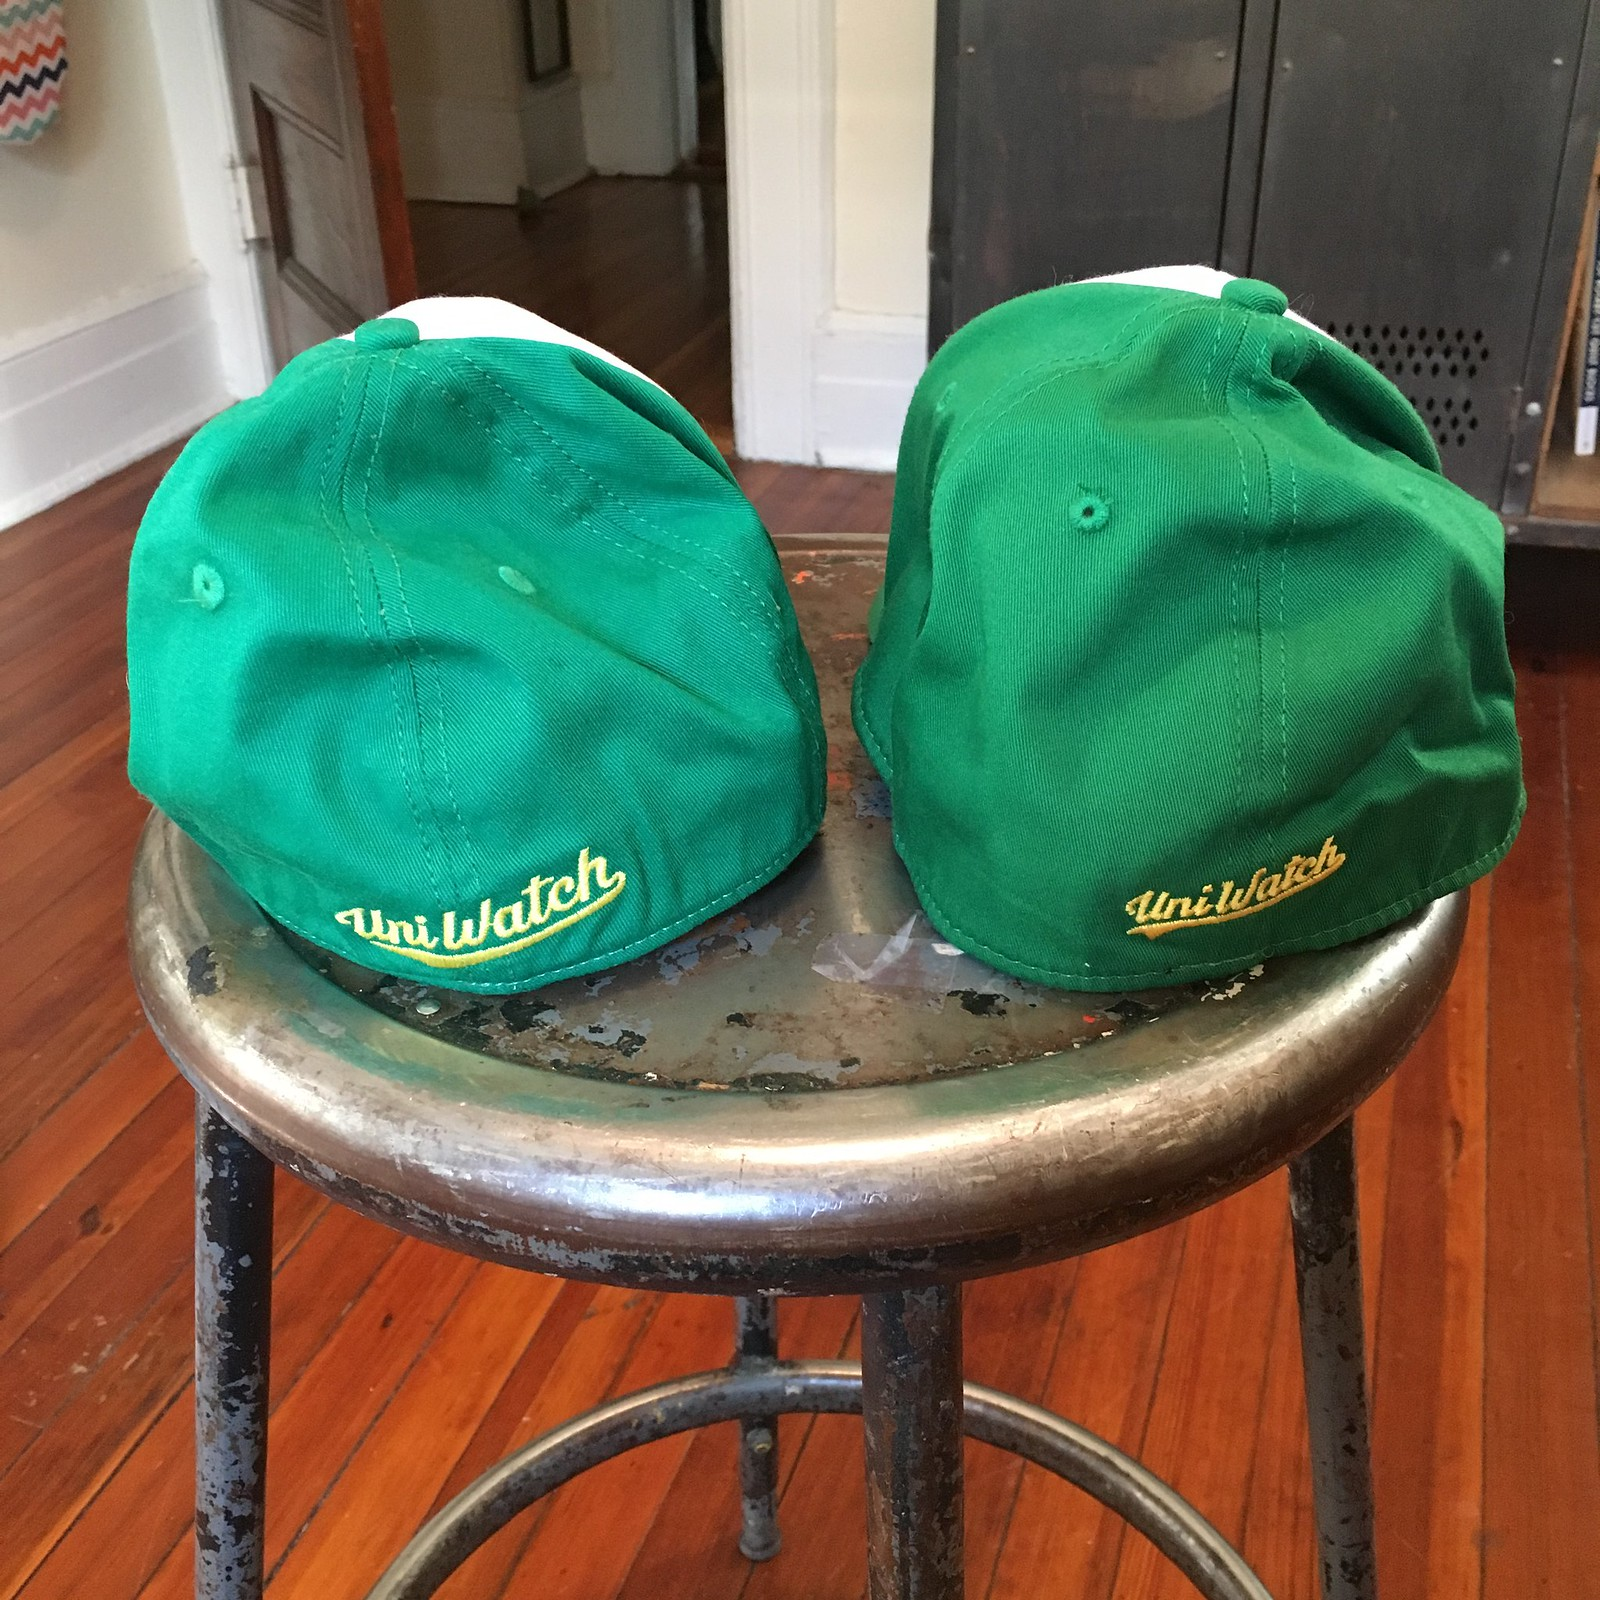 1d2e1e6a7e5 Each cap is a separate raffle item. Although they look similar